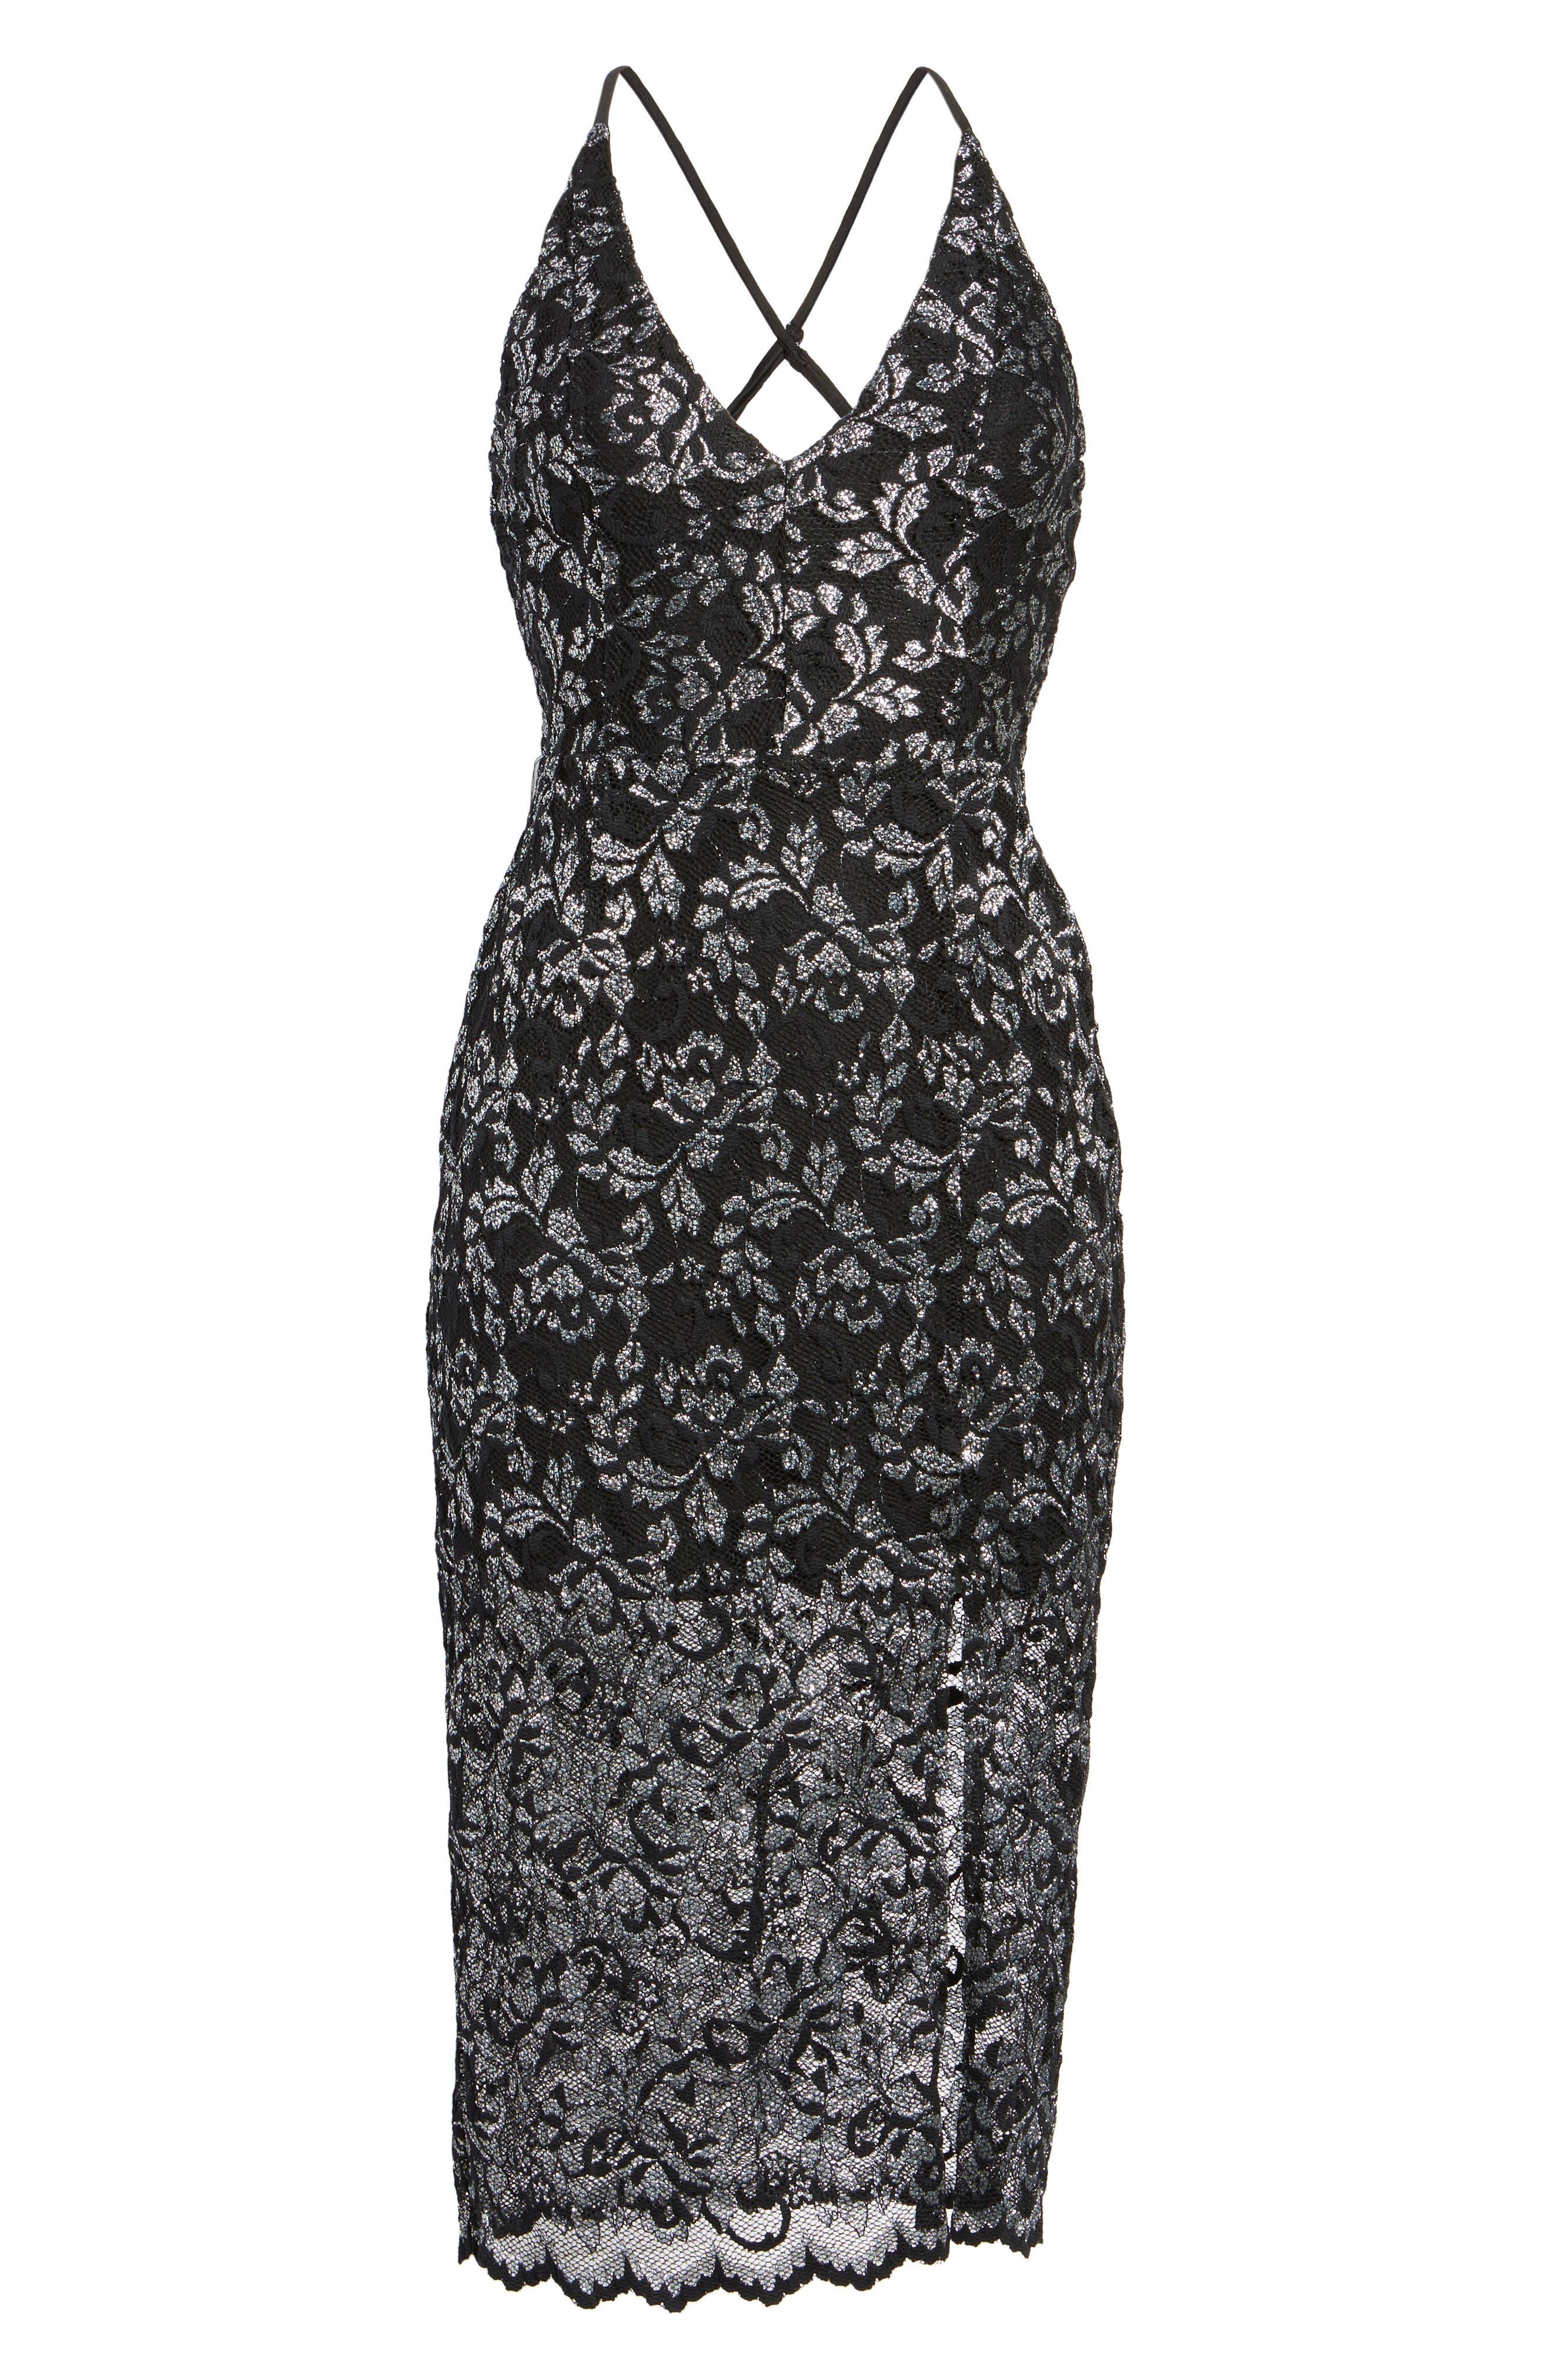 Sitabella Lace Dress,                             Alternate thumbnail 6, color,